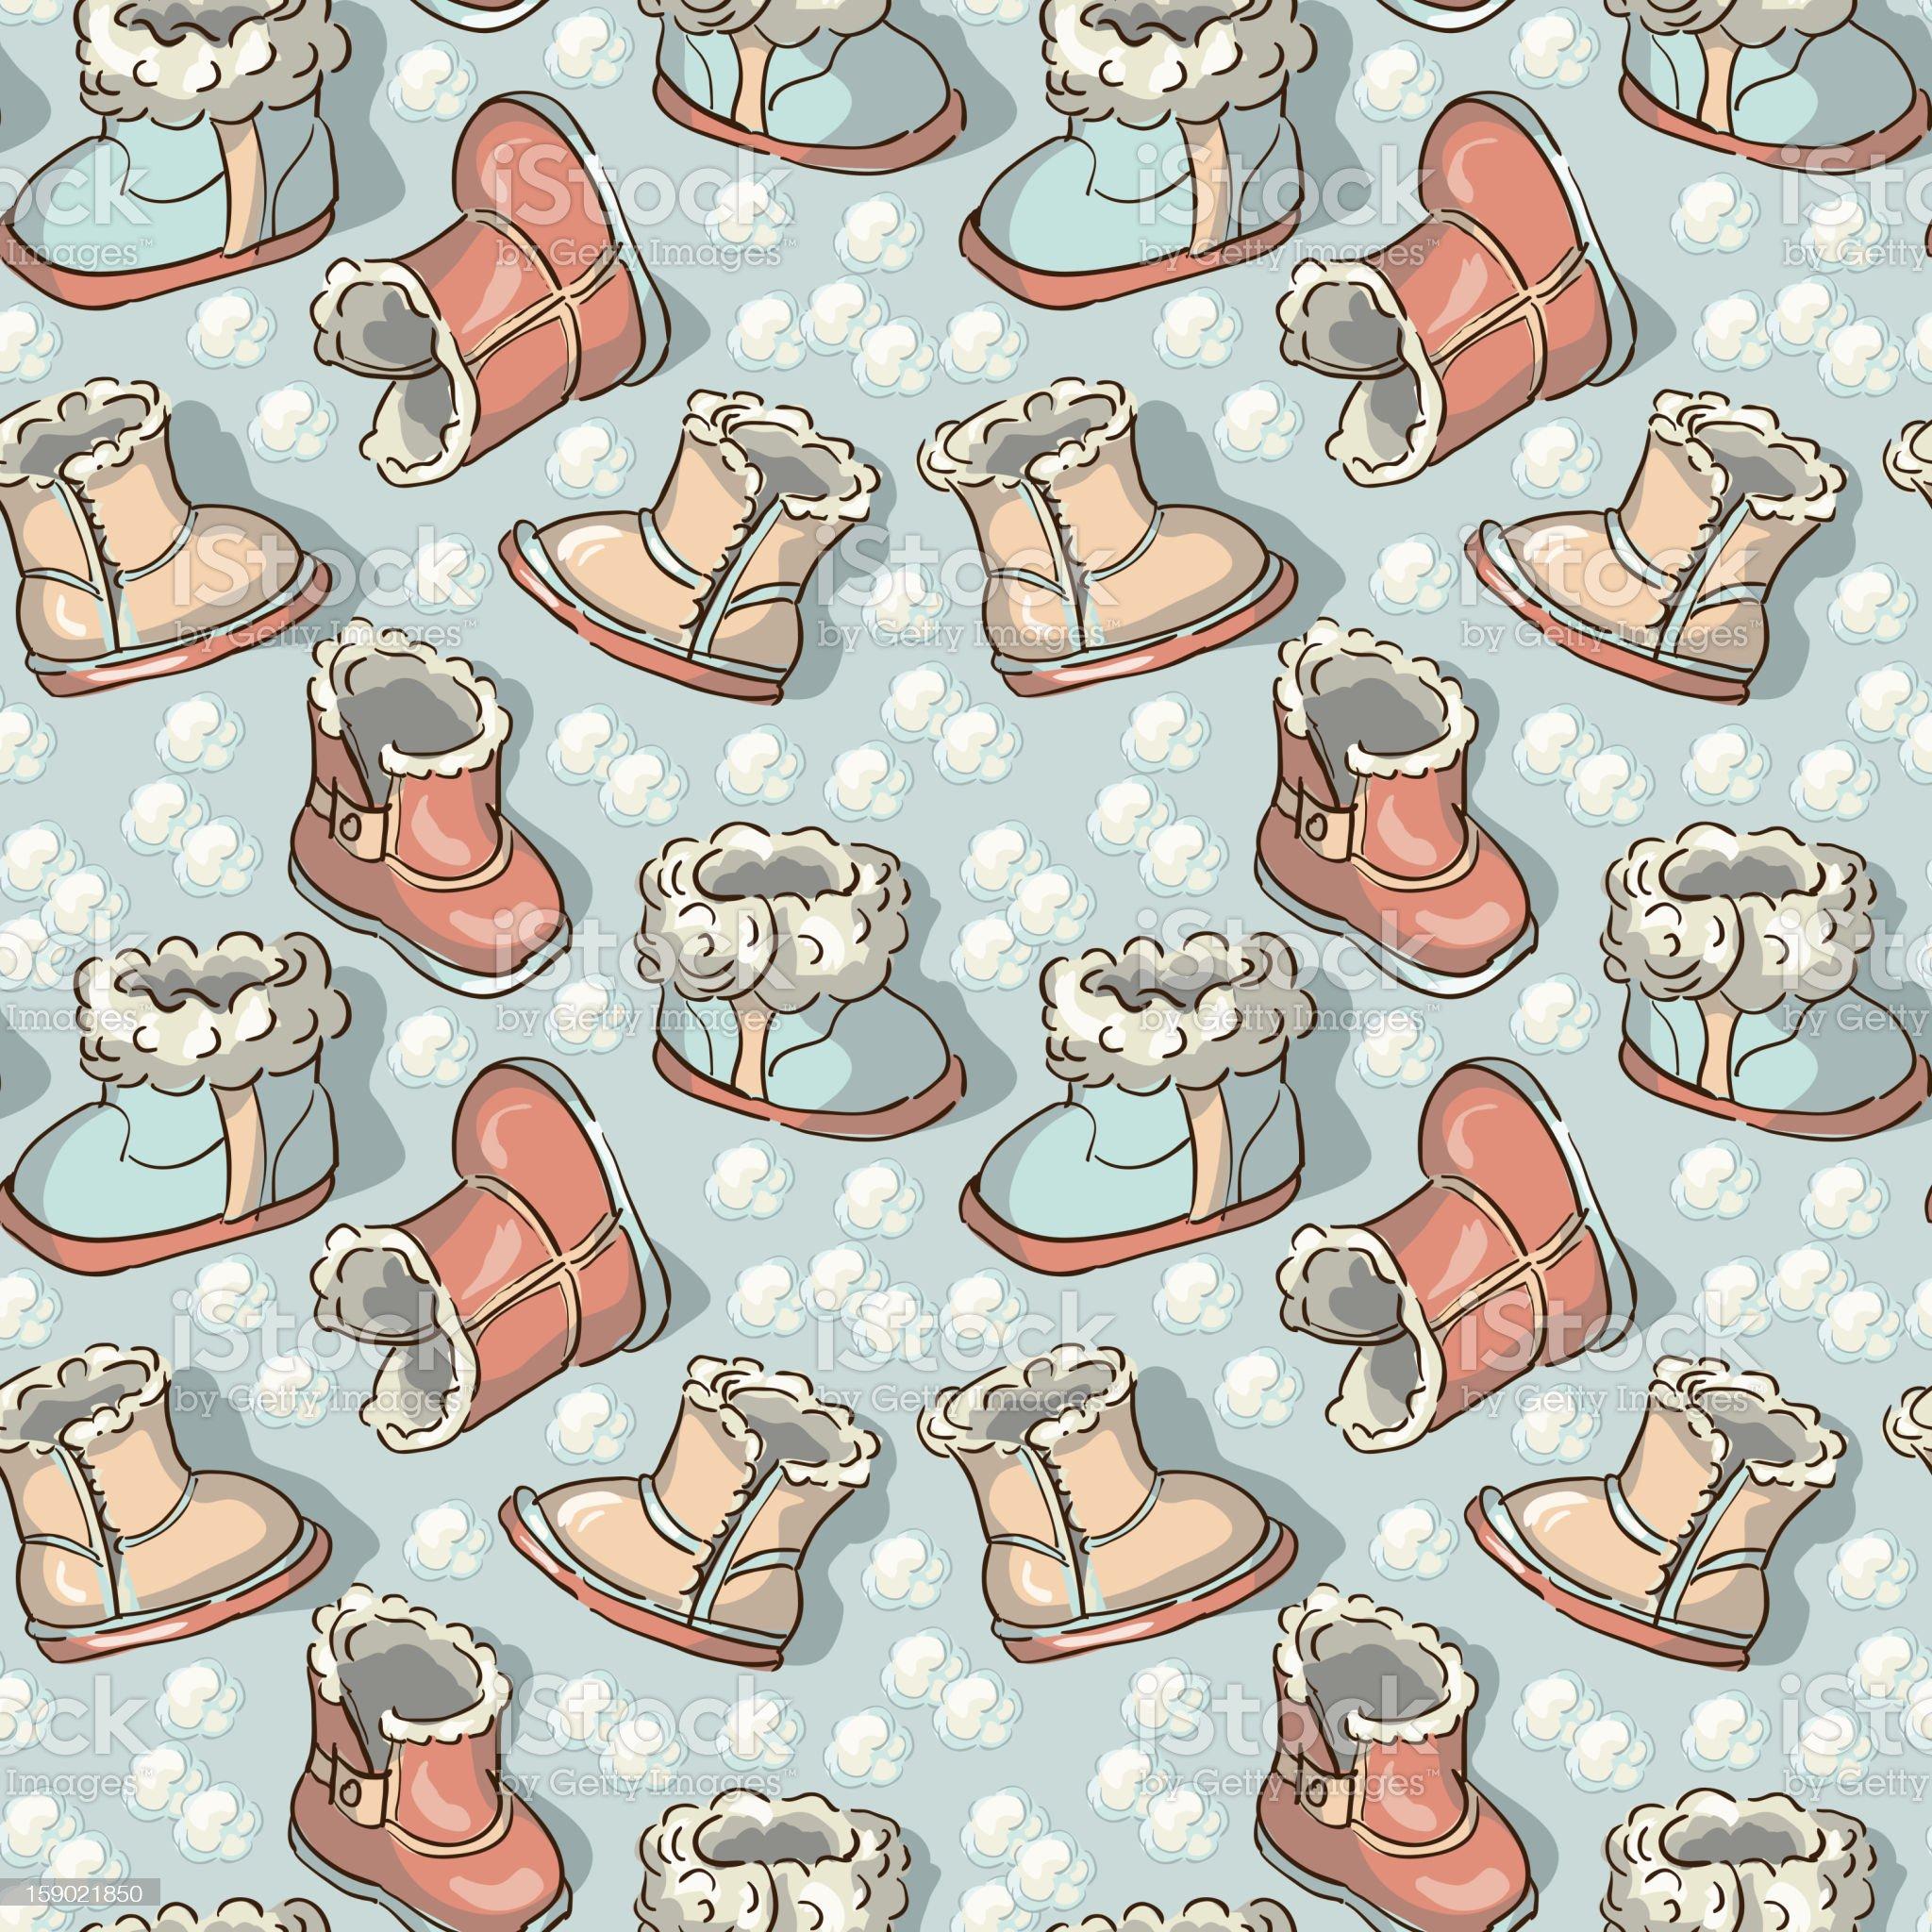 Children's boots royalty-free stock vector art